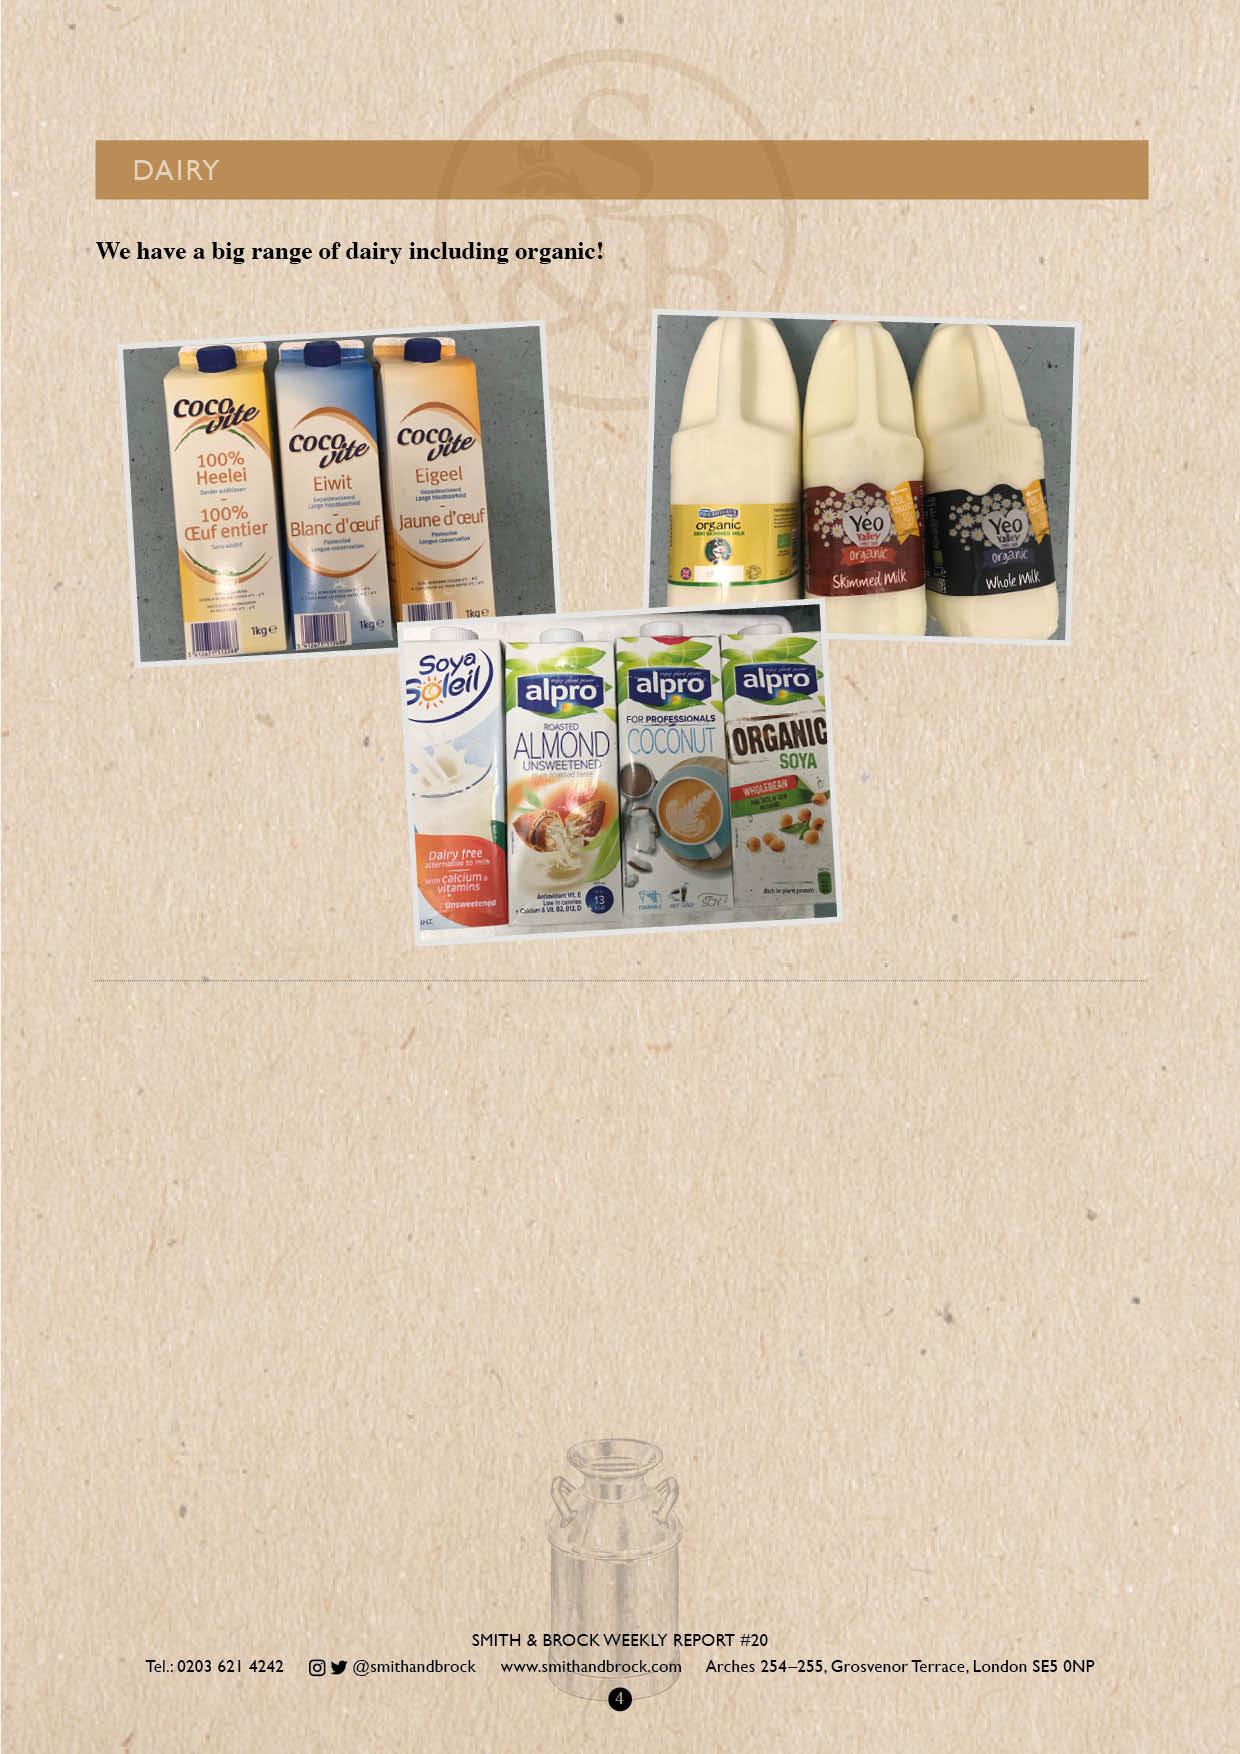 SmithBrock_dairie_cocovite_organic_milk_almondmilk_soyamilk_pasteurisedeggs